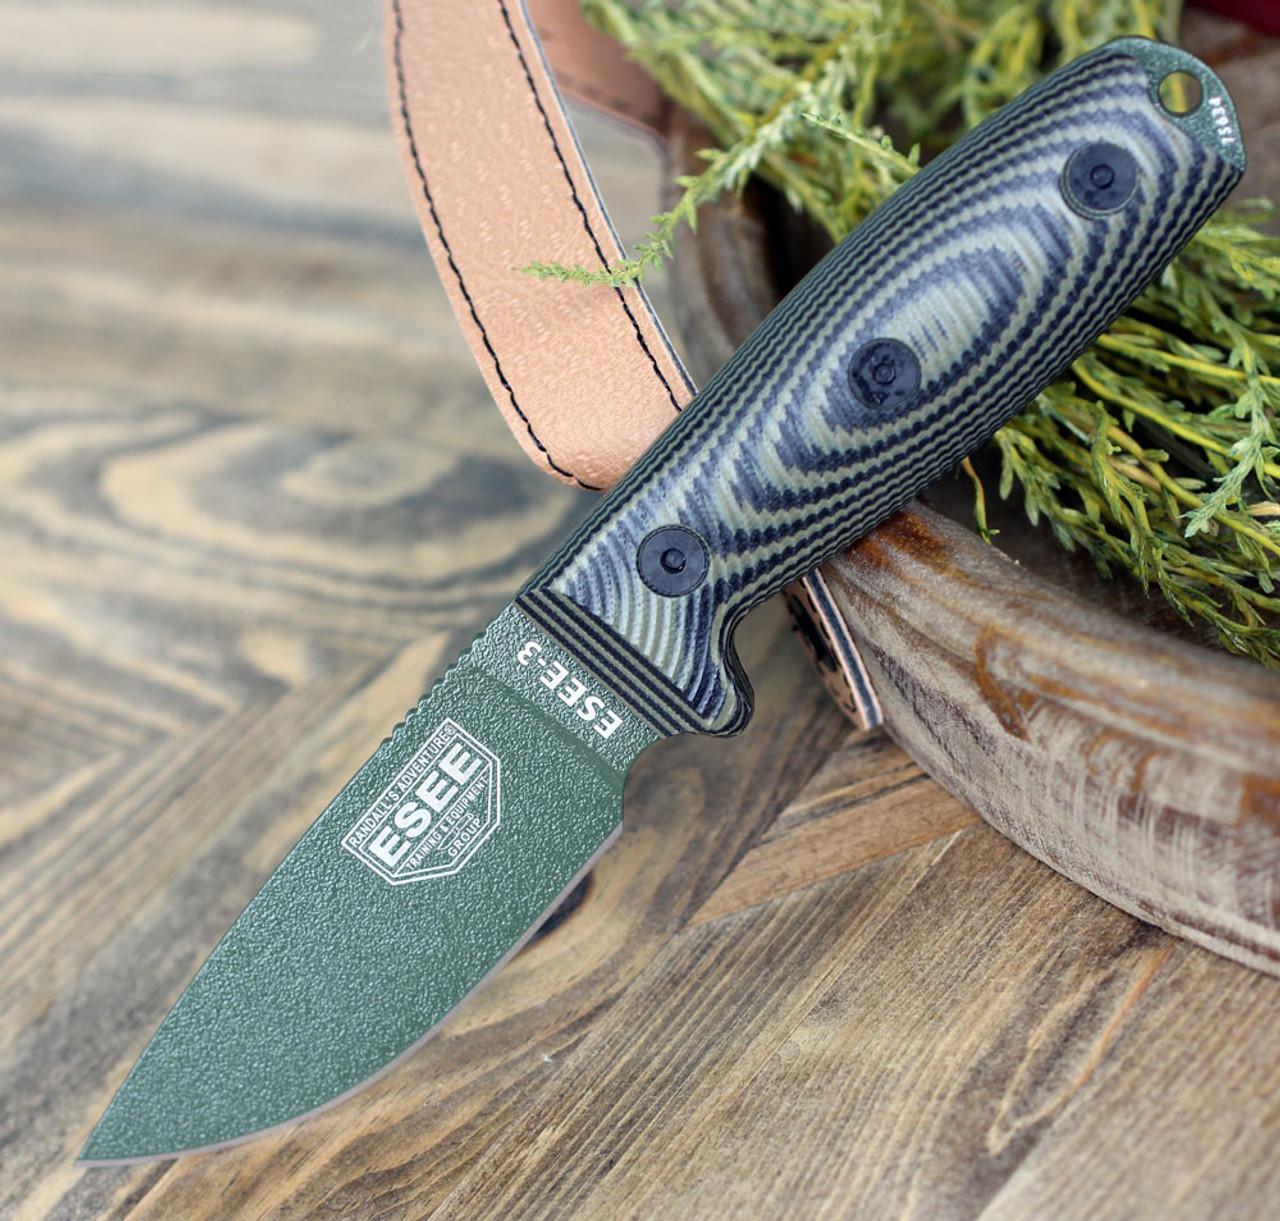 "ESEE-3 3PMOD-003, 3.88"" 1095 Carbon Steel OD Plain Blade, Green/Black G10 3D Handle, Black Sheath"